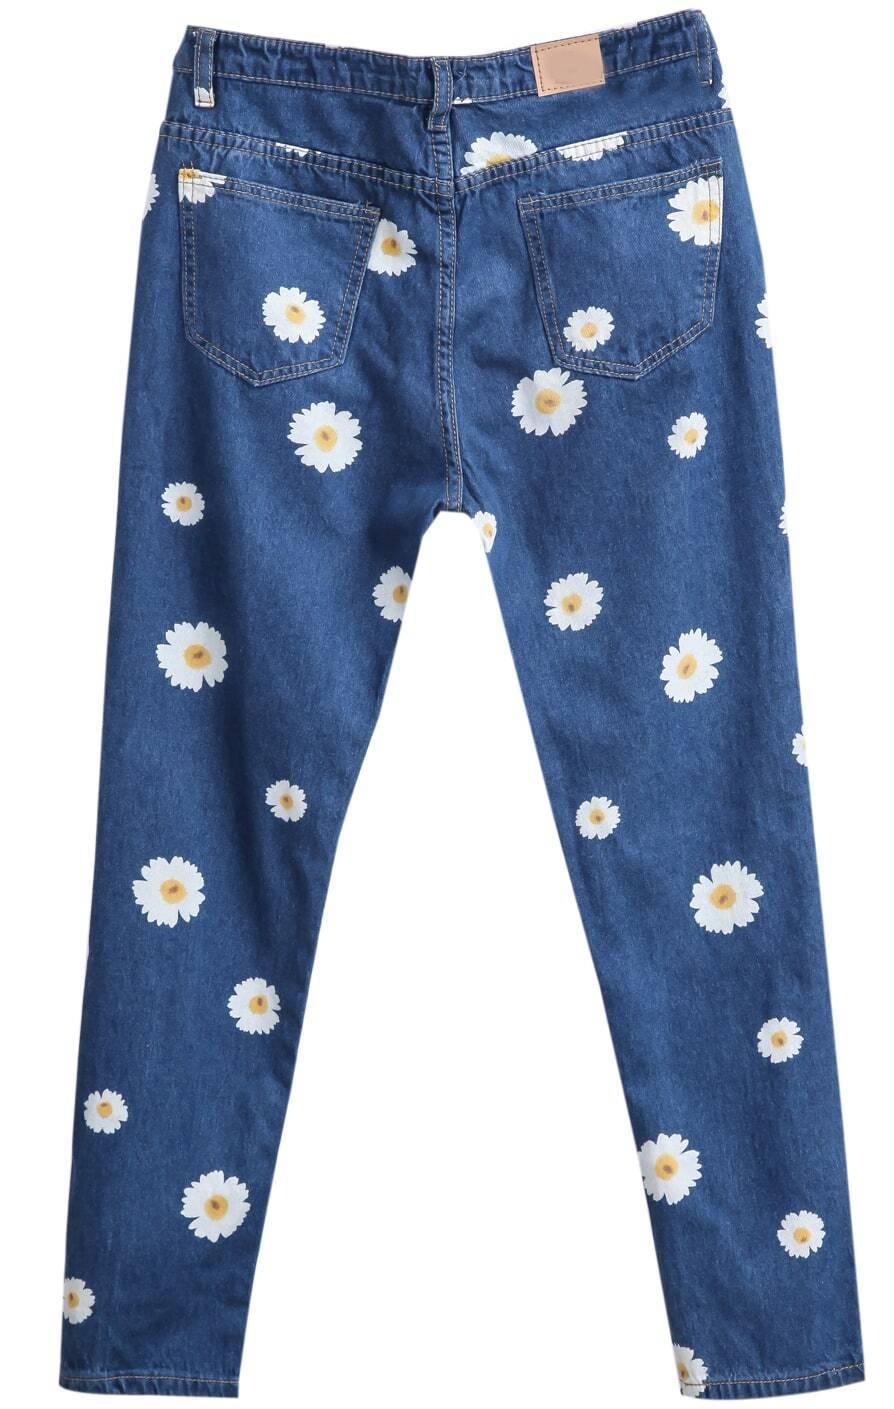 pantalon en jean motif marguerite avec poches french shein. Black Bedroom Furniture Sets. Home Design Ideas